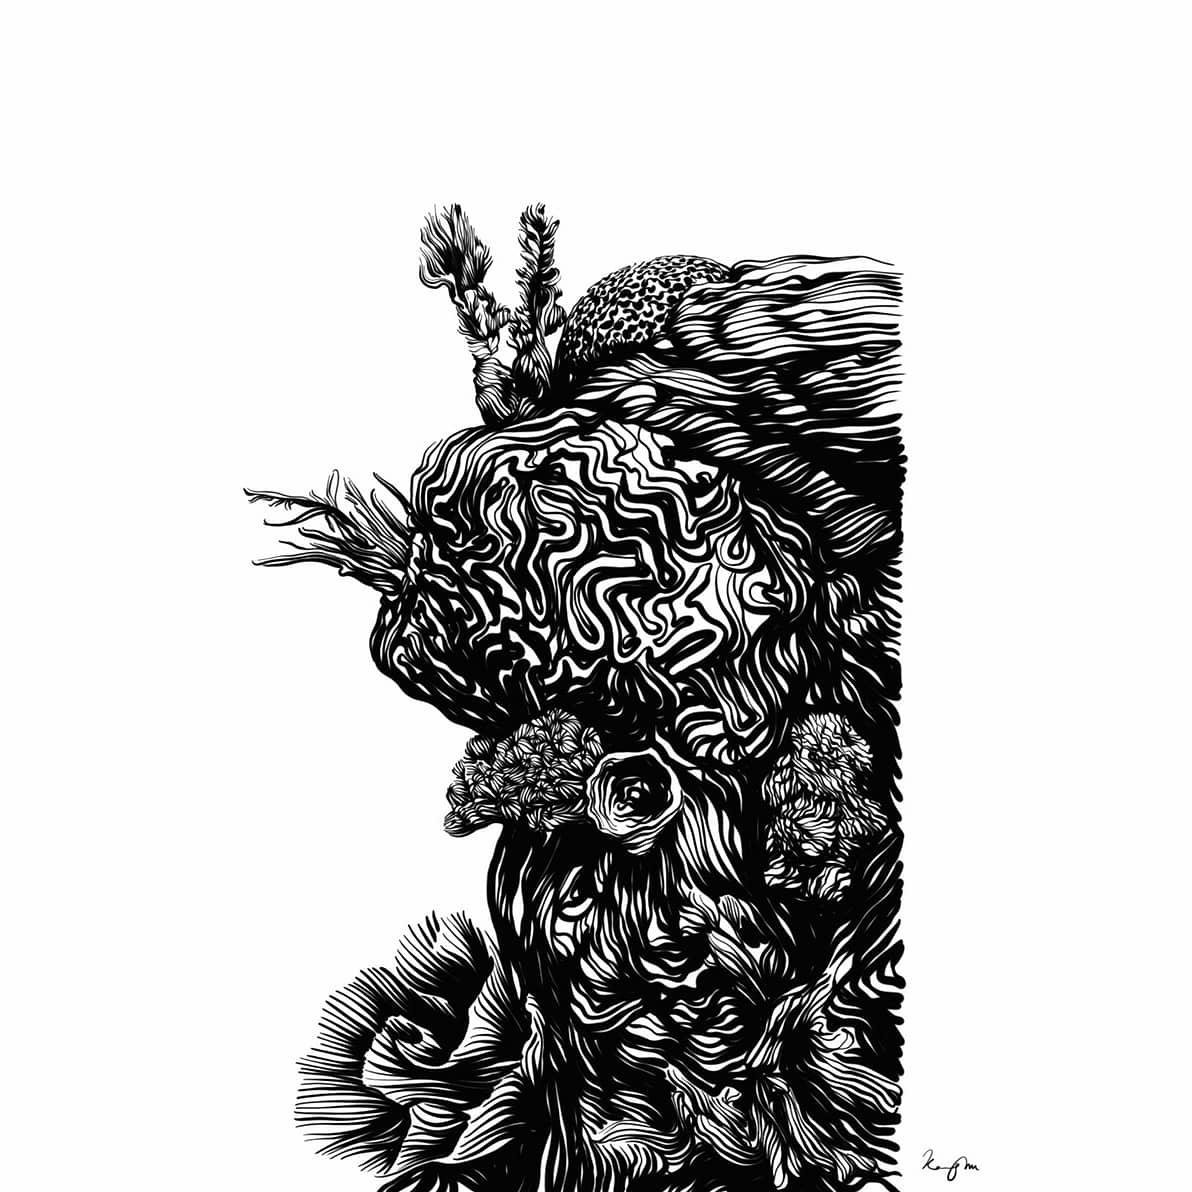 Day 20  第二十天 #coral #珊瑚 #inktober #inktober2020  #black #黑 #blackandwhite #黑白 #ink #inkdrawing  #fish #魚 #undersea #海底 #underwater #水中的 #stingray #魟魚 https://t.co/TioreaBaSK